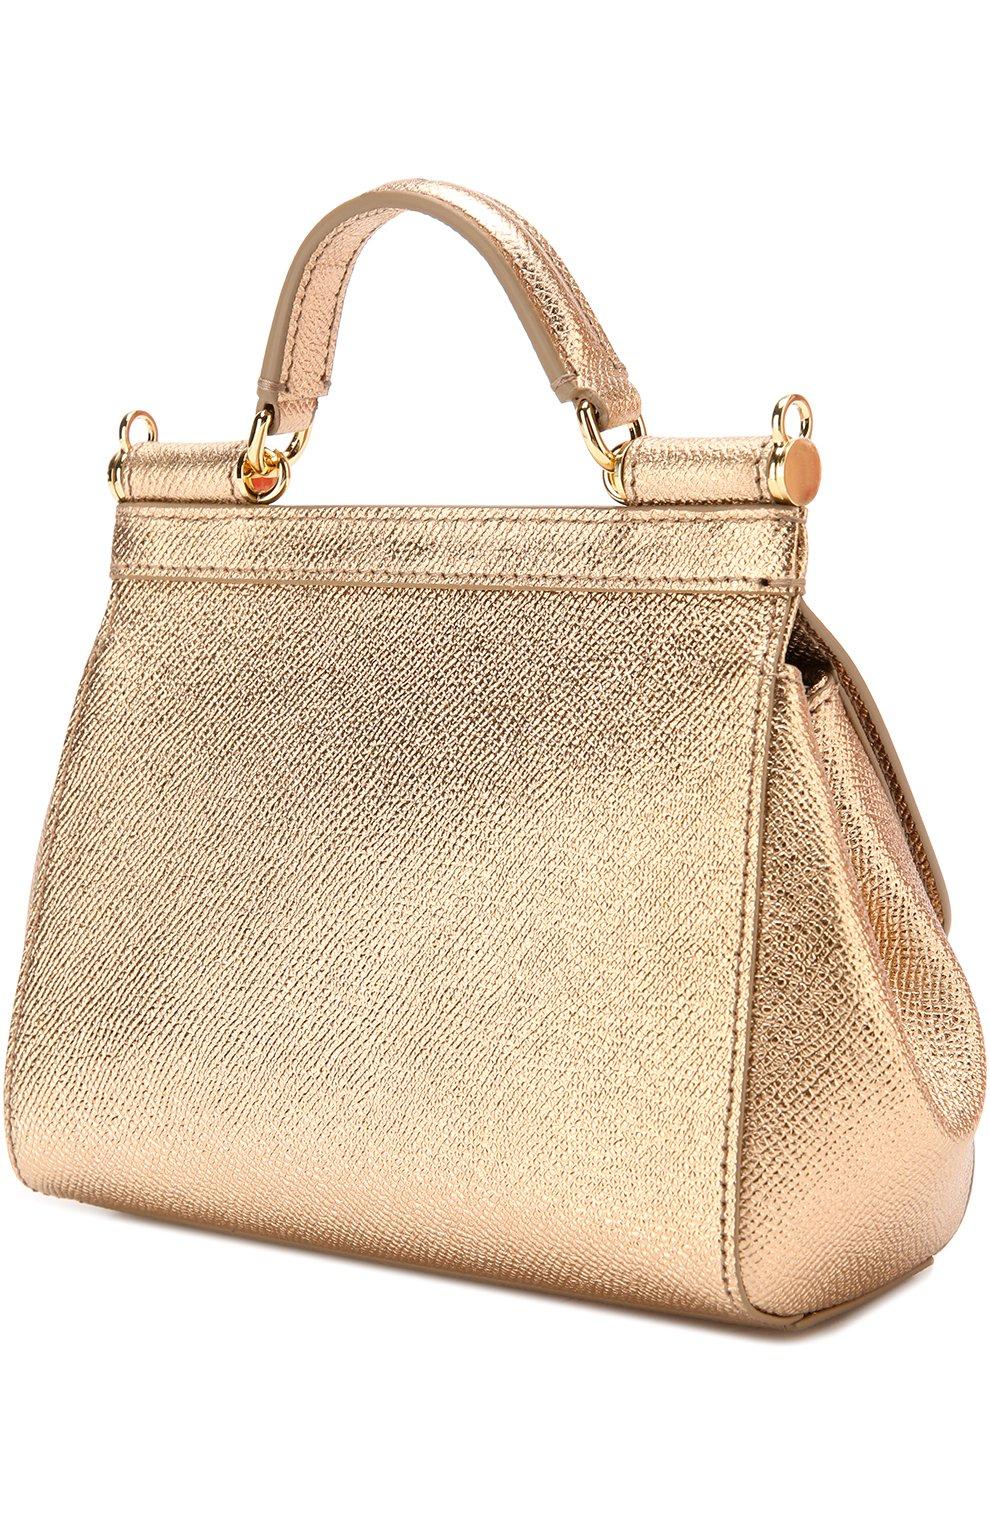 Сумка Sicily micro с брошью Dolce & Gabbana золотая цвета   Фото №3